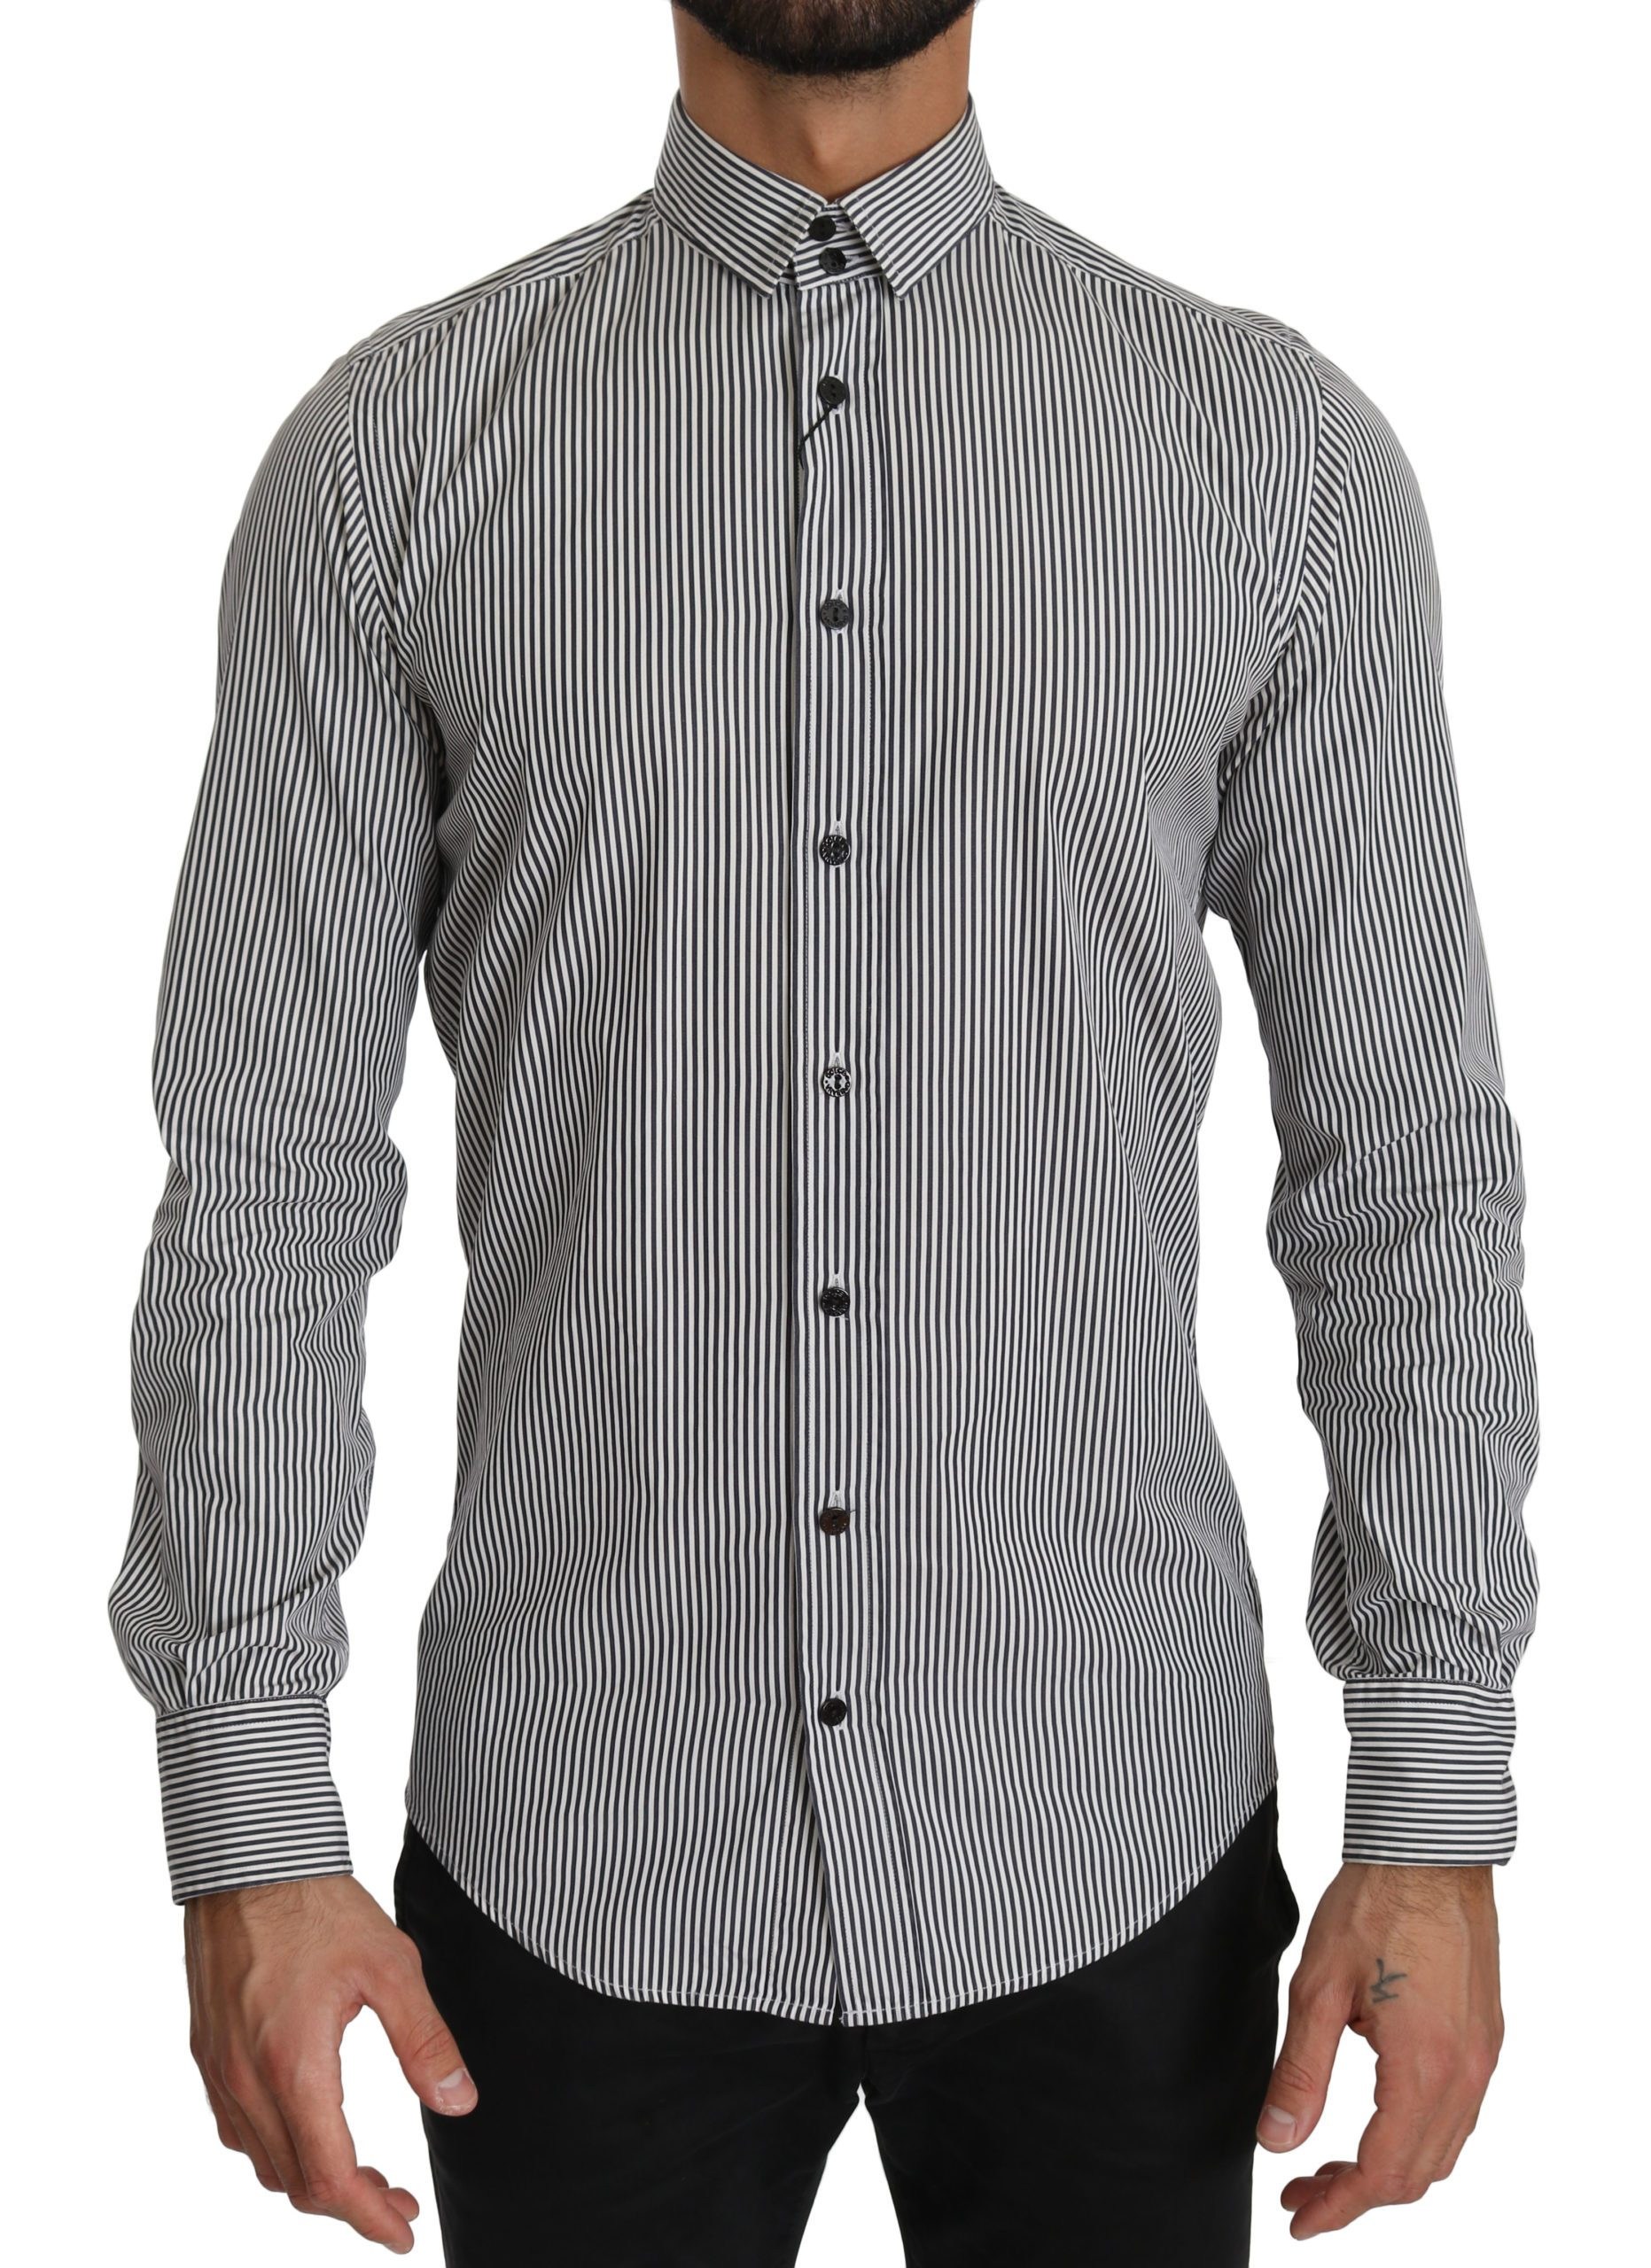 Dolce & Gabbana Men's Stripes Formal Shirt Black TSH4024 - IT39 | S